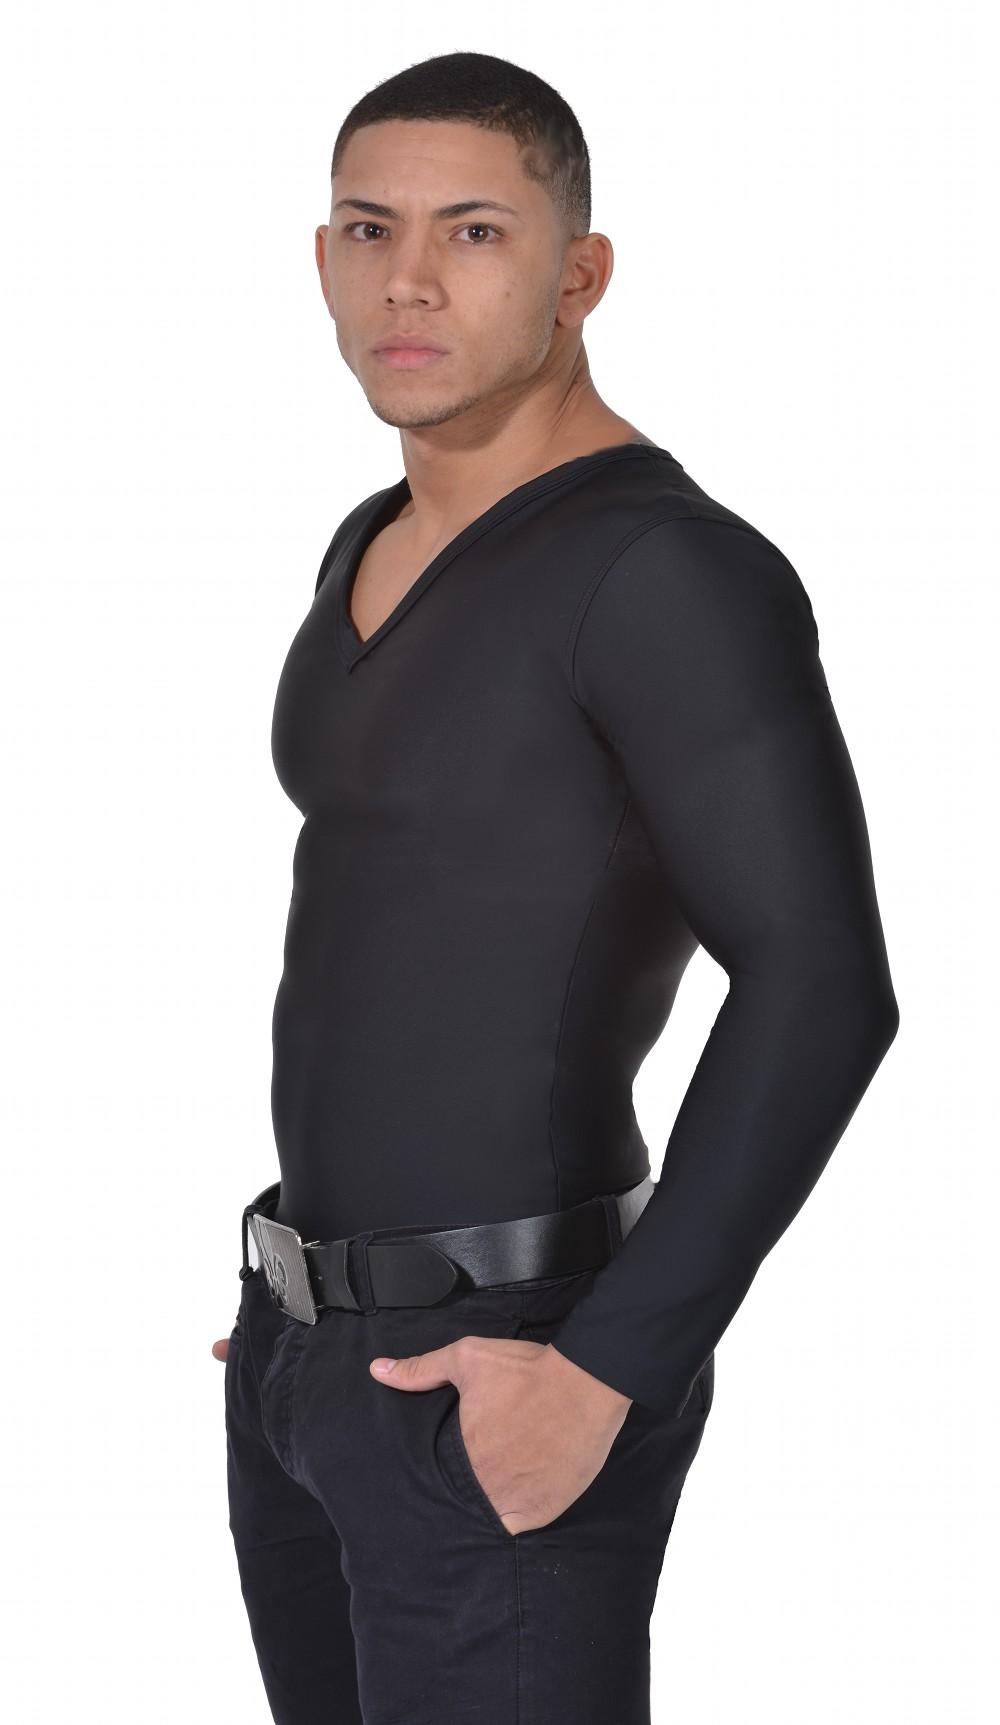 Men's Slimming Undershirt Body Shaper Arm control Shapewear Long Sleeve black side